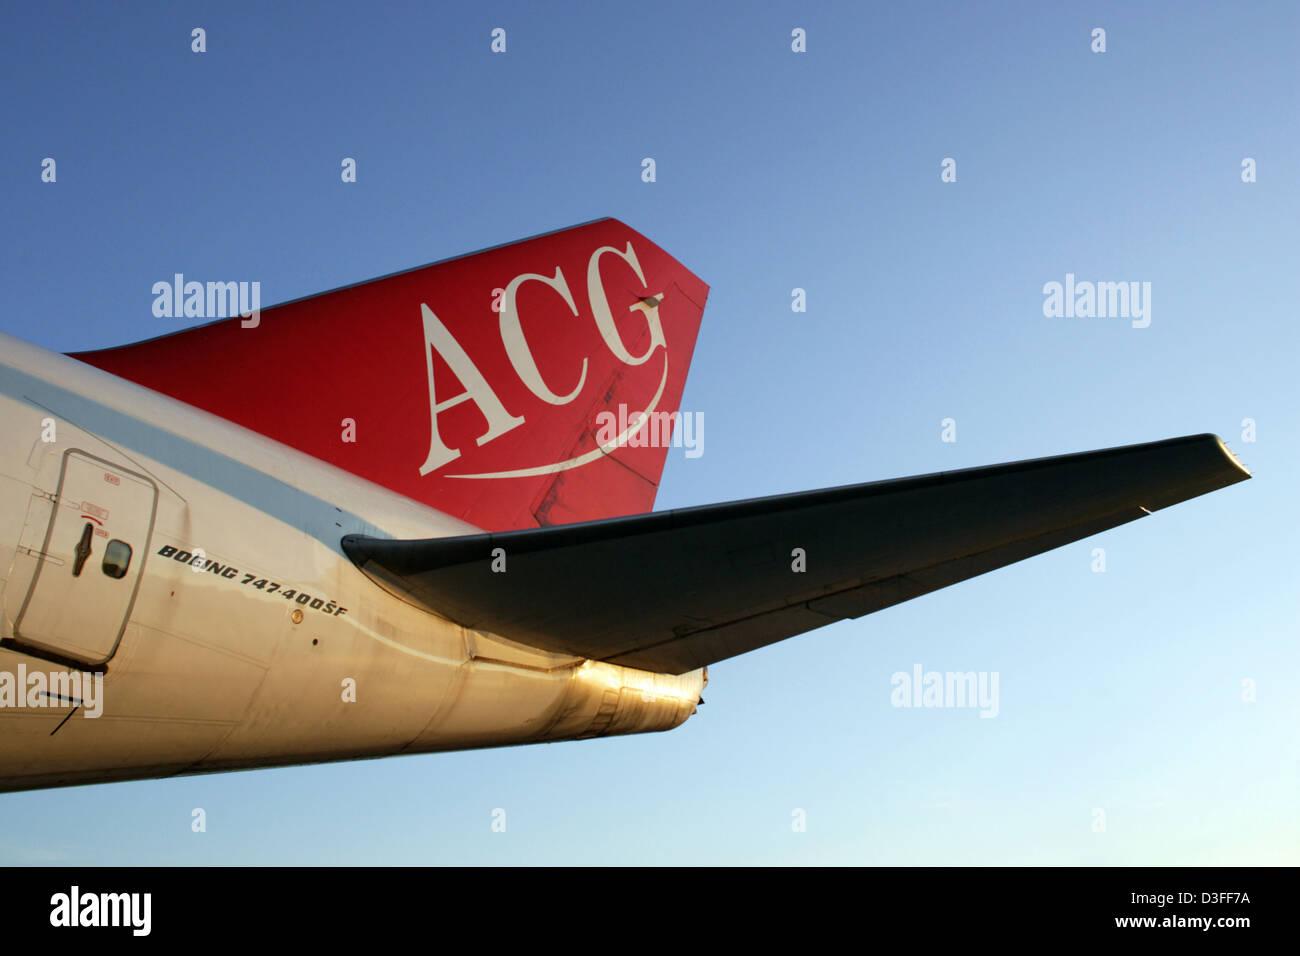 Schoenefeld, Germany, Heckfluegel the Air Cargo Germany machine - Stock Image